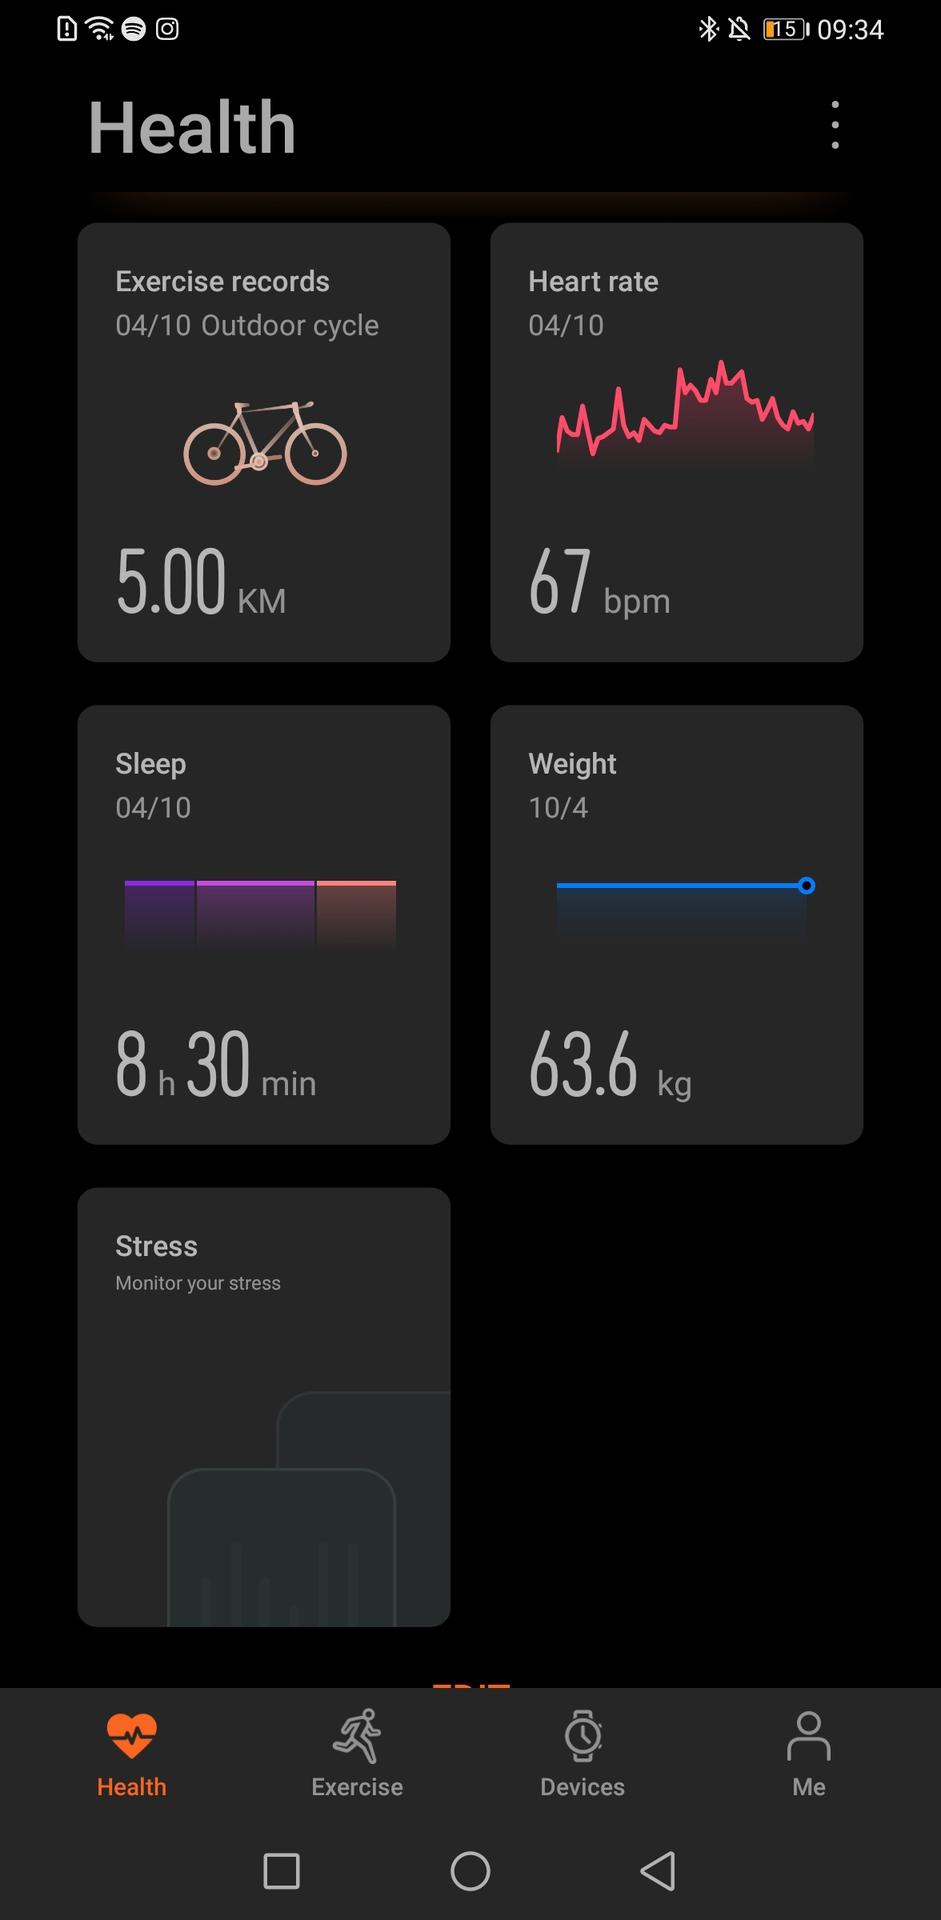 Huawei Health App Health page